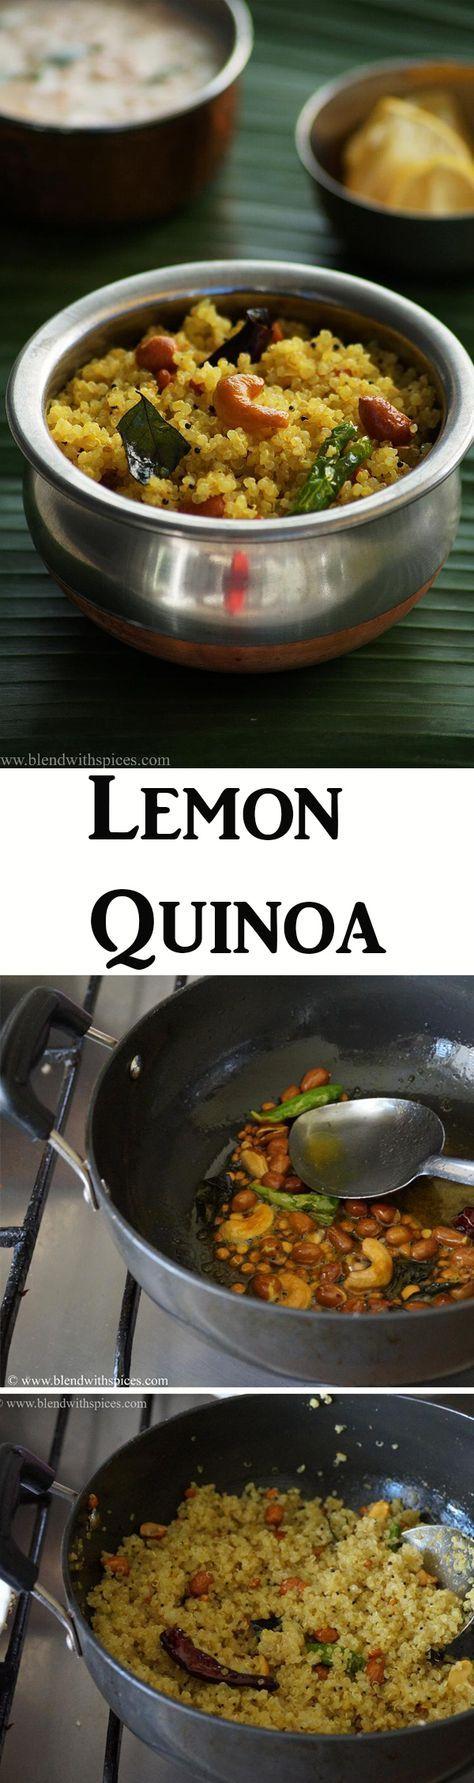 Photo of Lemon Quinoa Recipe – How to Make Quinoa Lemon Pulihora Recipe